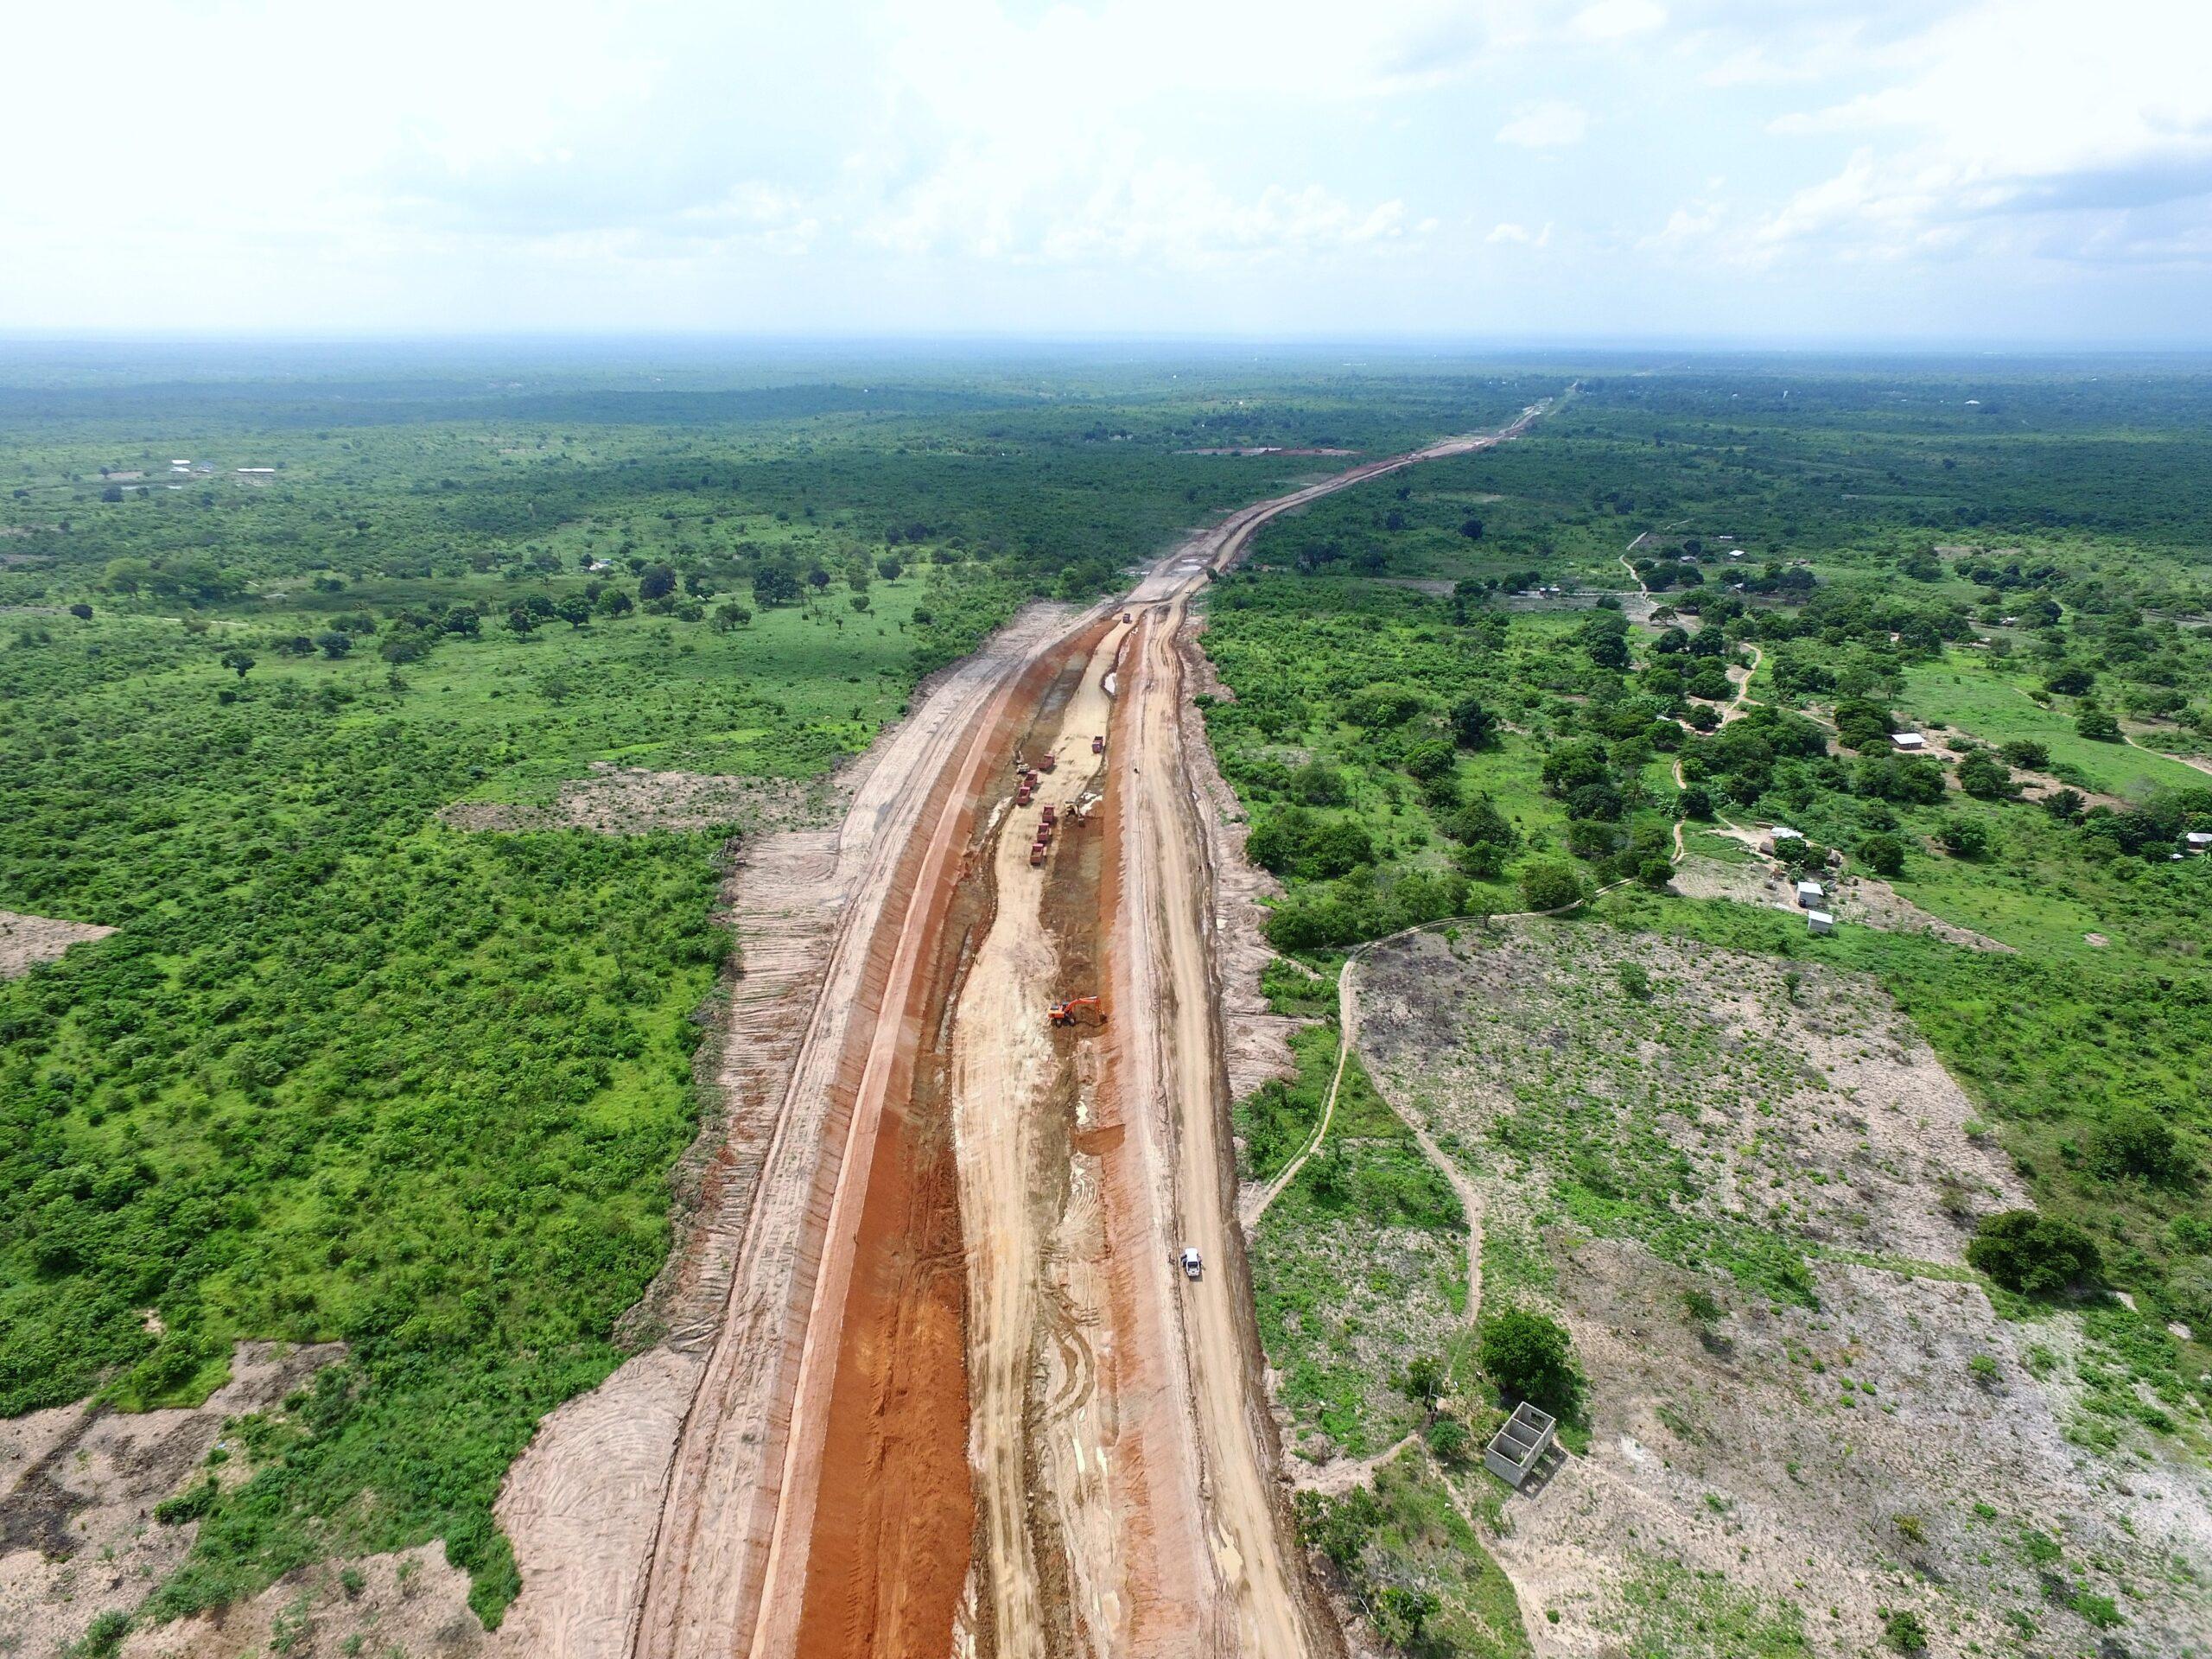 Dar es Salaam - Morogoro - Makutupora Railway Line